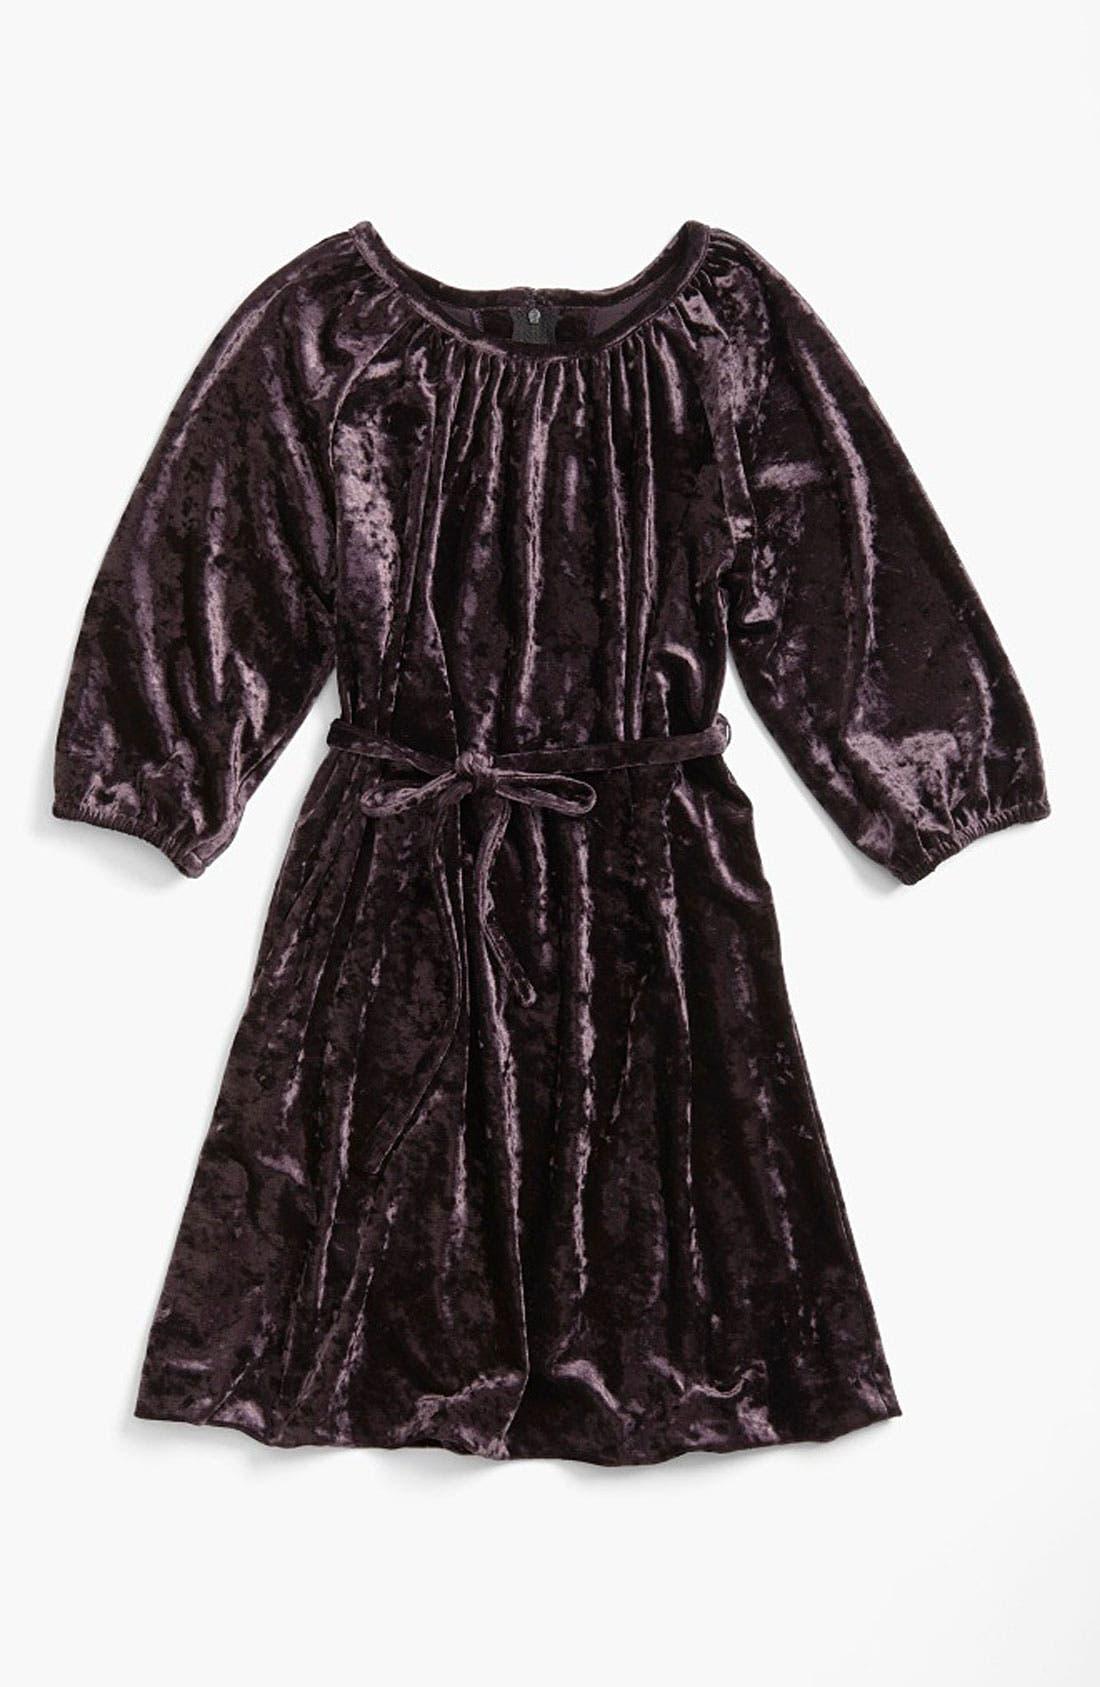 Main Image - Peek 'Norma' Dress (Toddler, Little Girls & Big Girls)